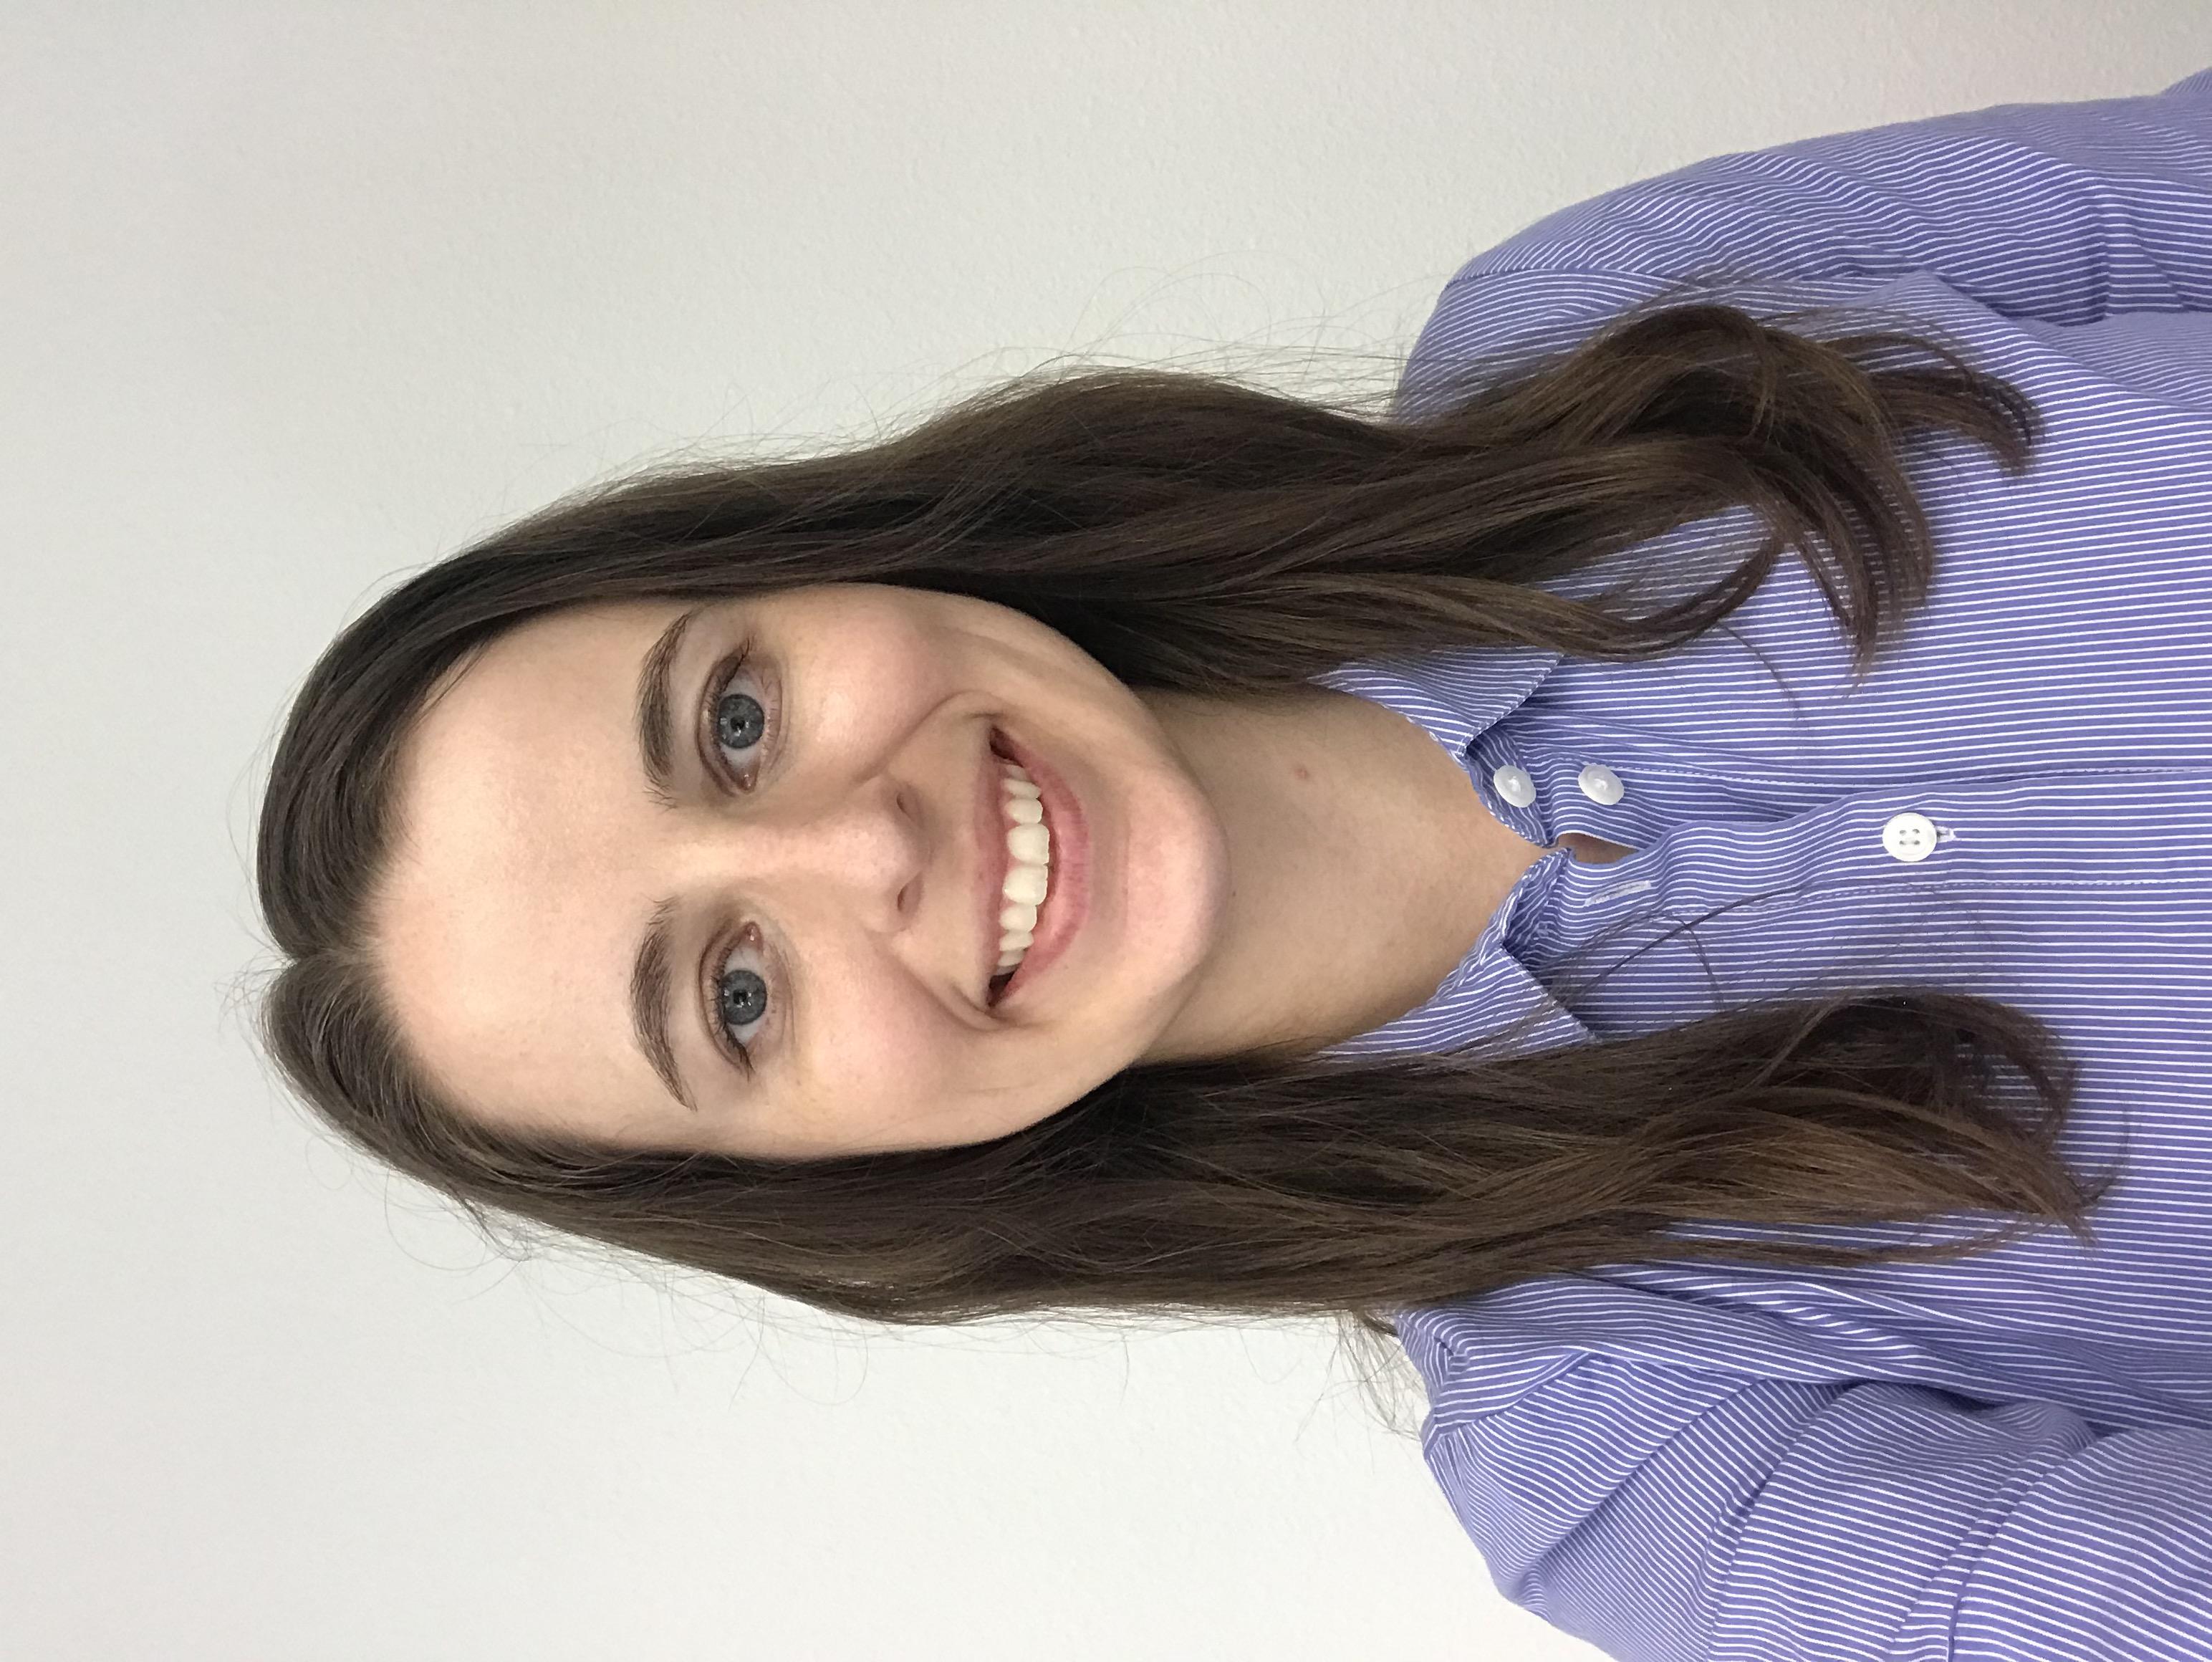 Lauren Utterback smiling